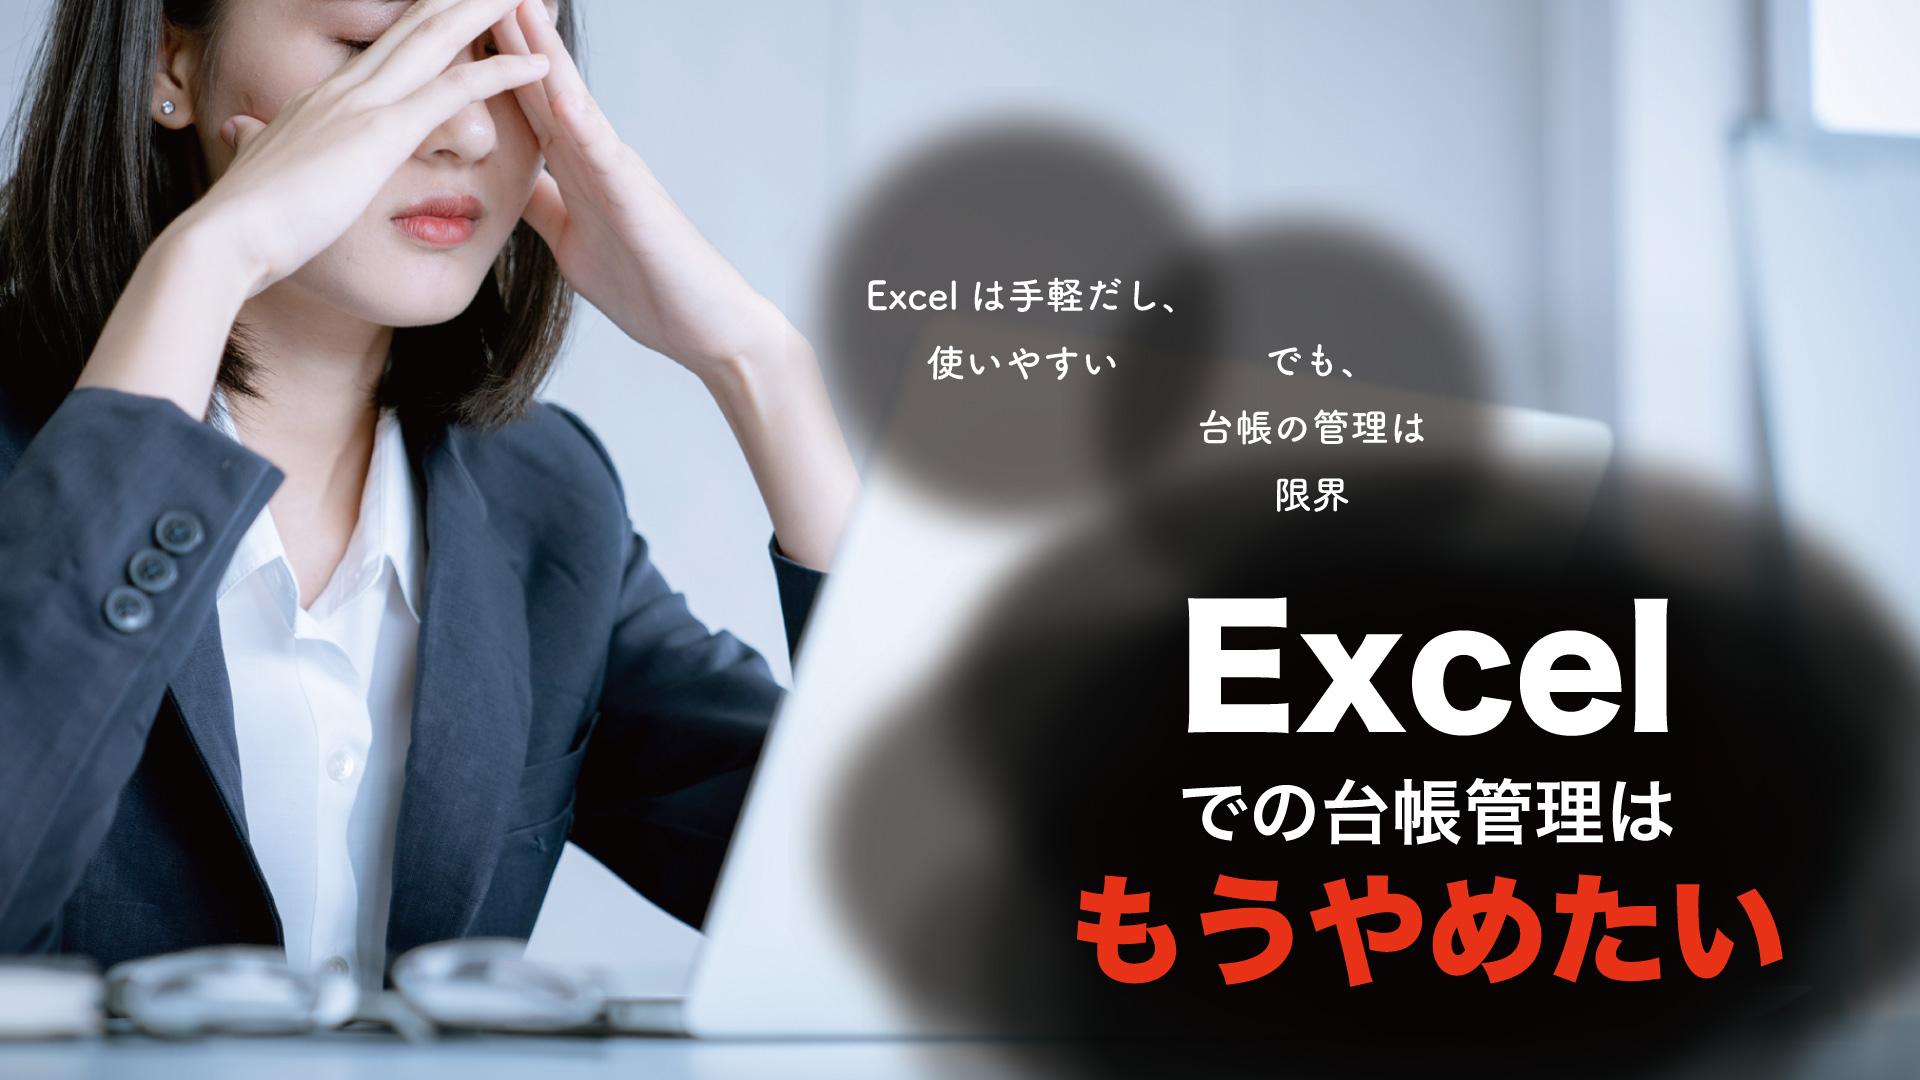 Excelでの台帳管理はもうやめたい